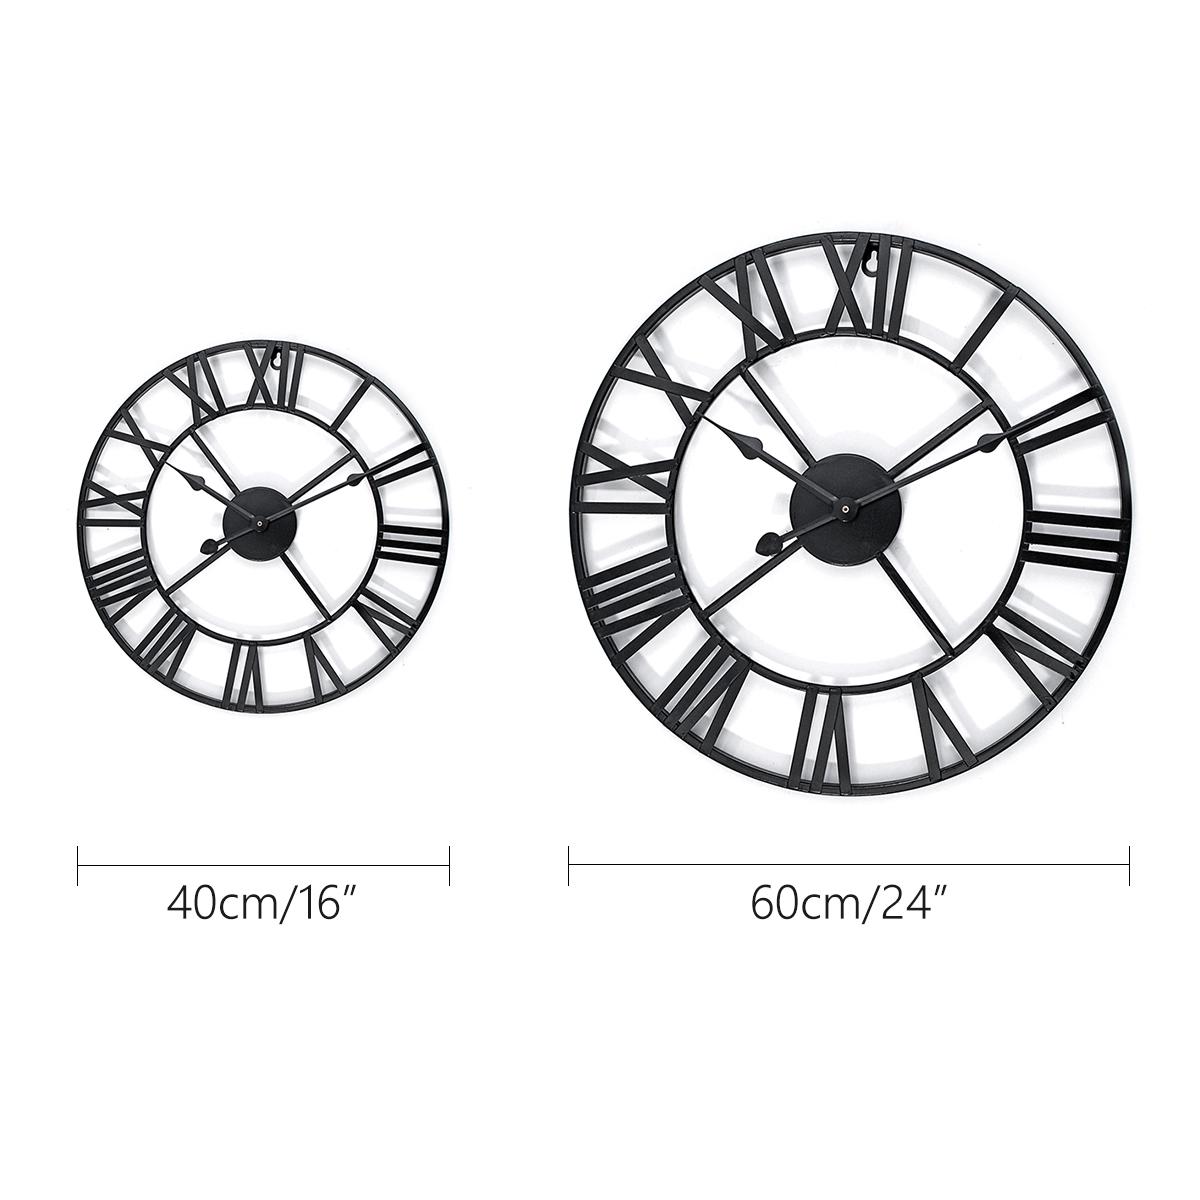 40/60cm Large Metal Skeleton Roman Numeral Wall Clock Black Round Shape